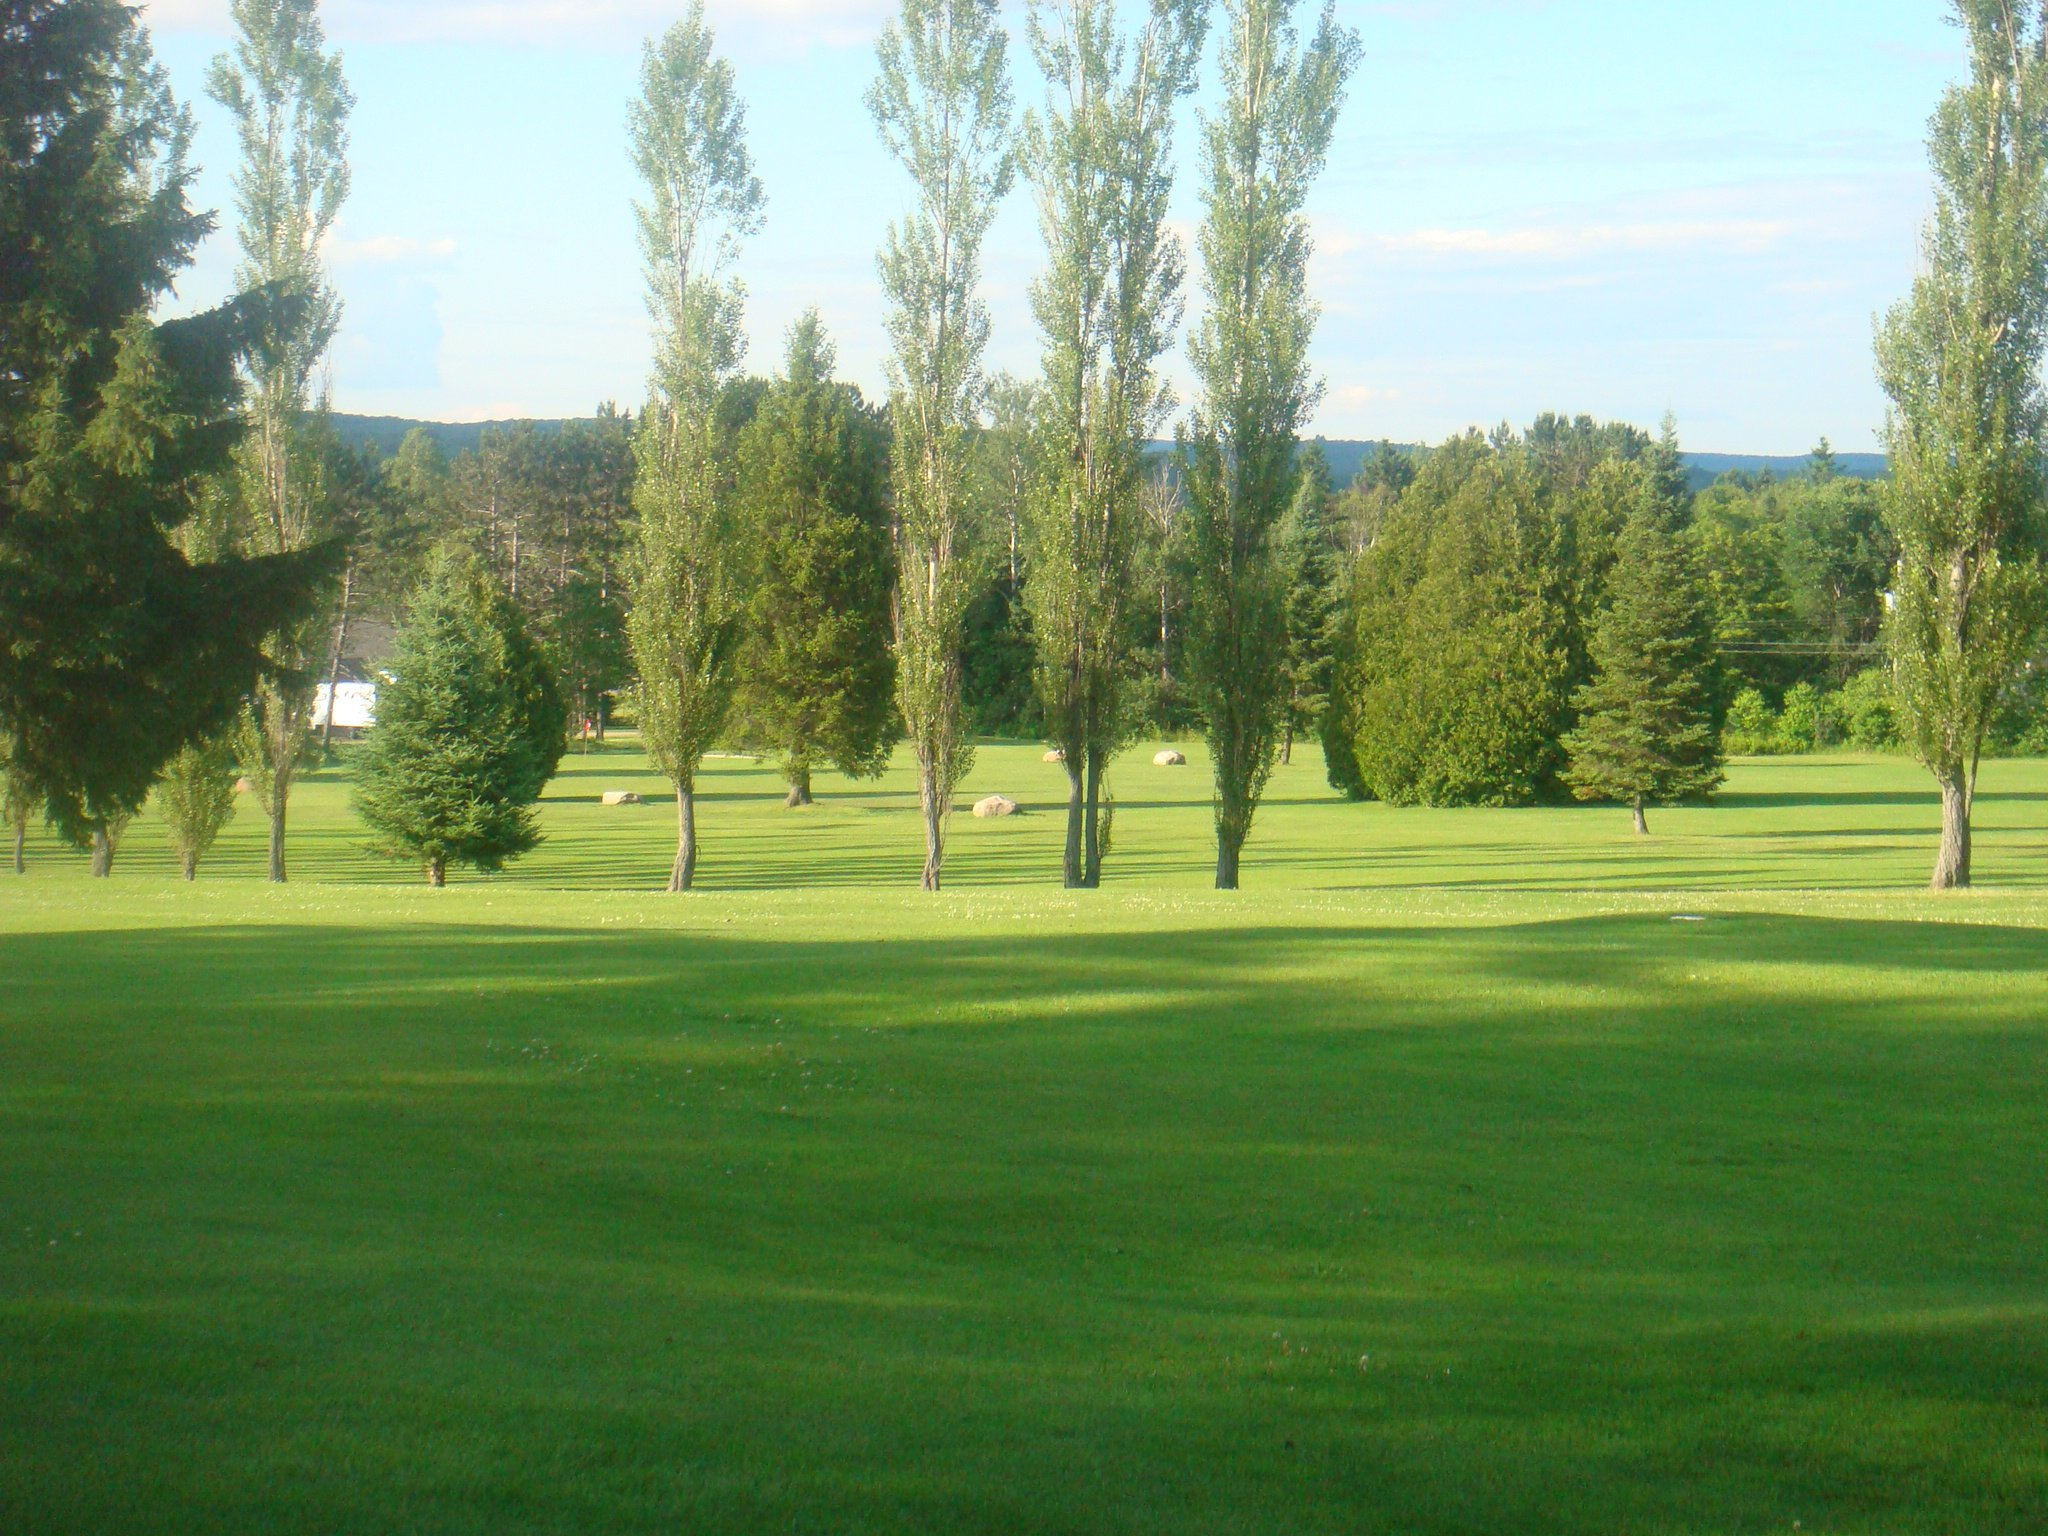 Overview of golf course named Ten Gables Golf Inn